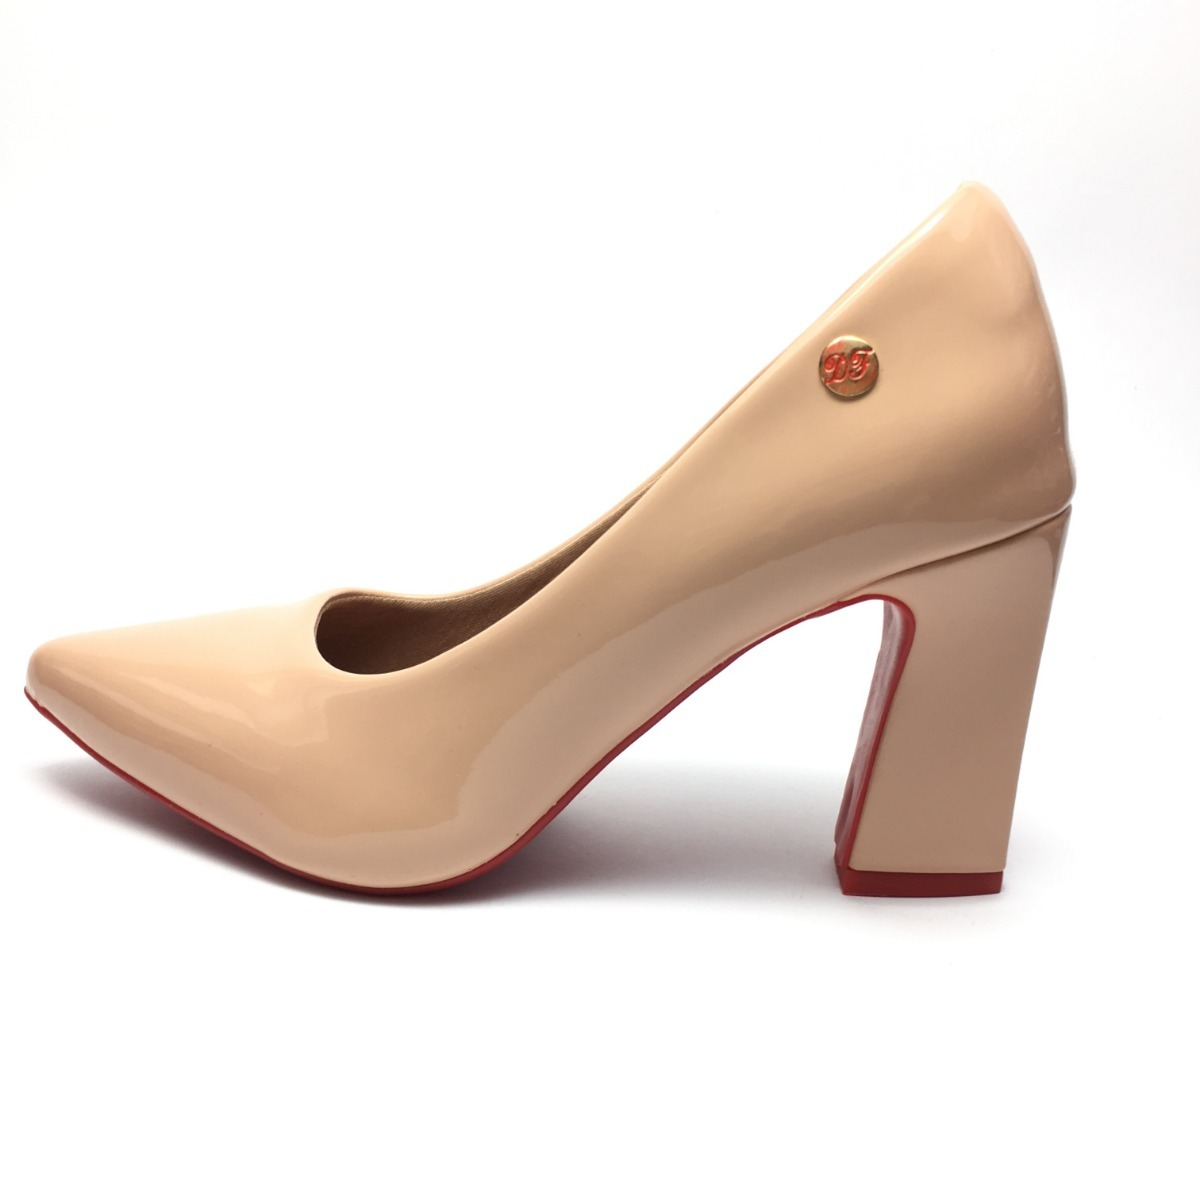 f5a6c257dc sapato feminino scarpin salto alto grosso festa evento nude. Carregando zoom .